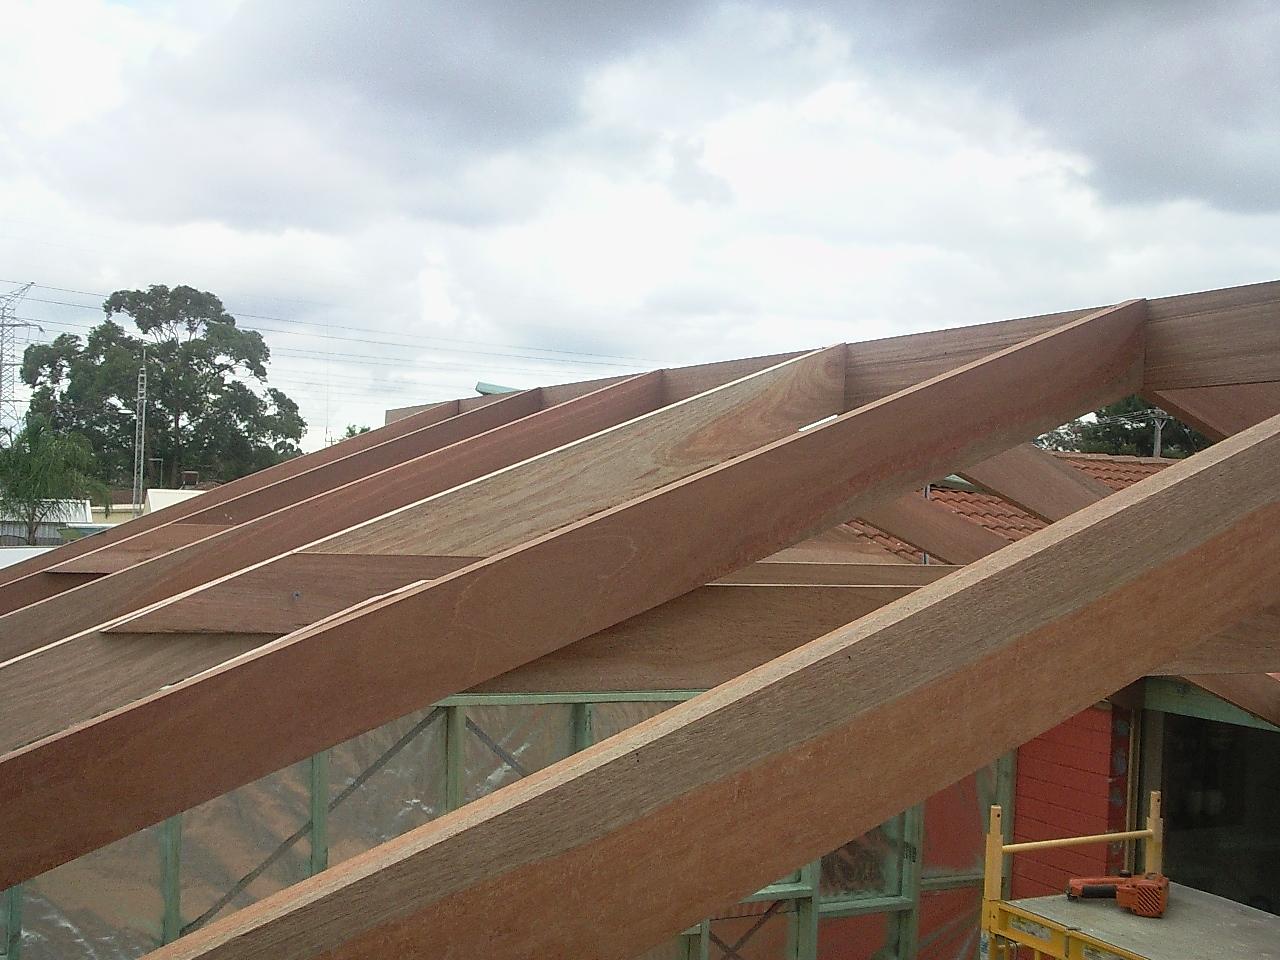 Roof under construction, Bibra Lake